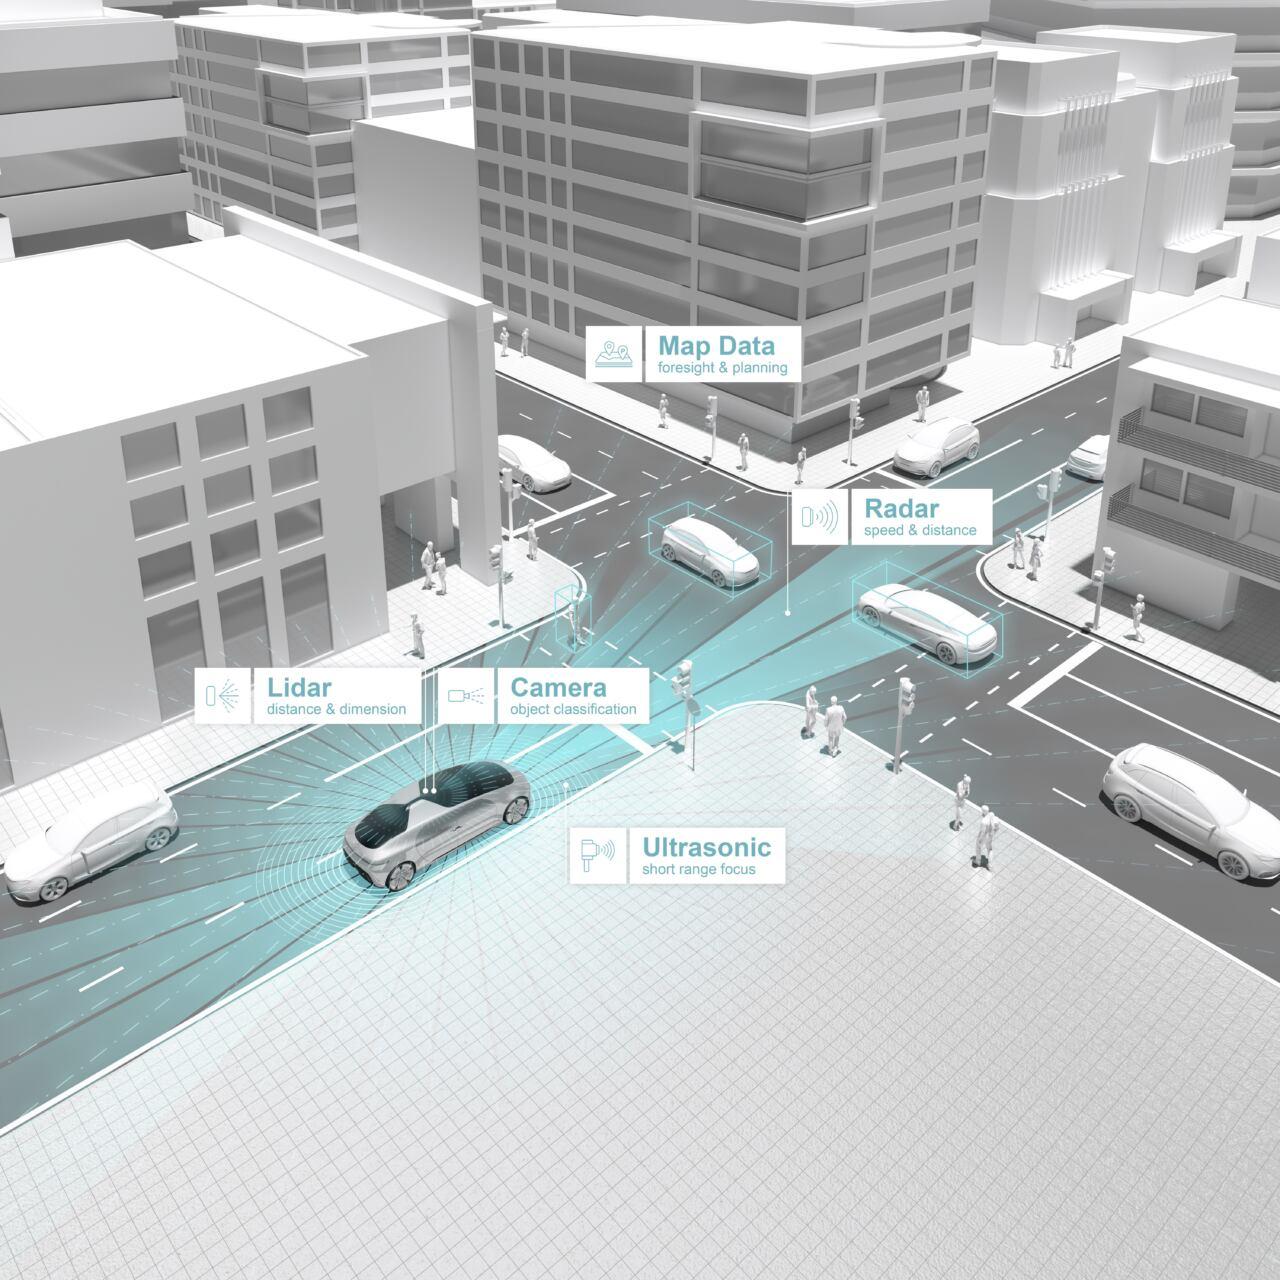 Mercedes intelligenza artificiale